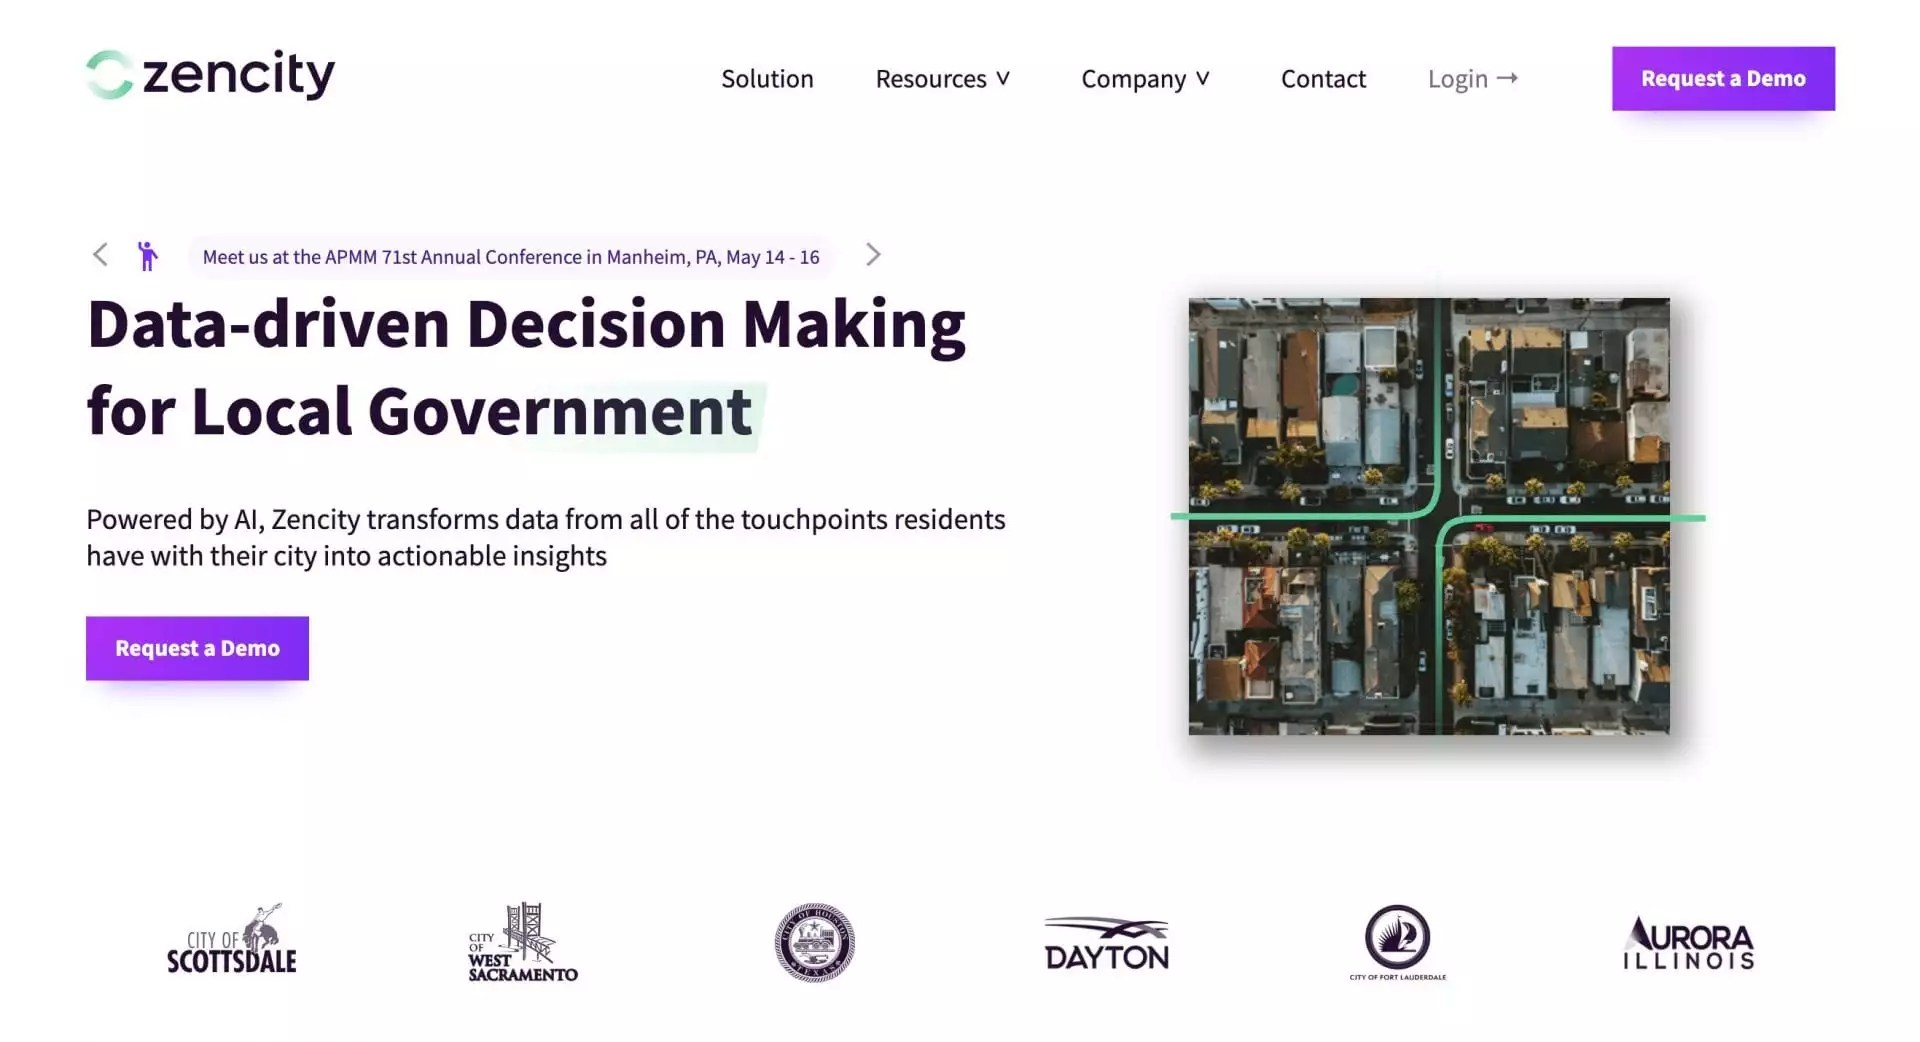 Zencity - Data-driven Decision Making for Local Government